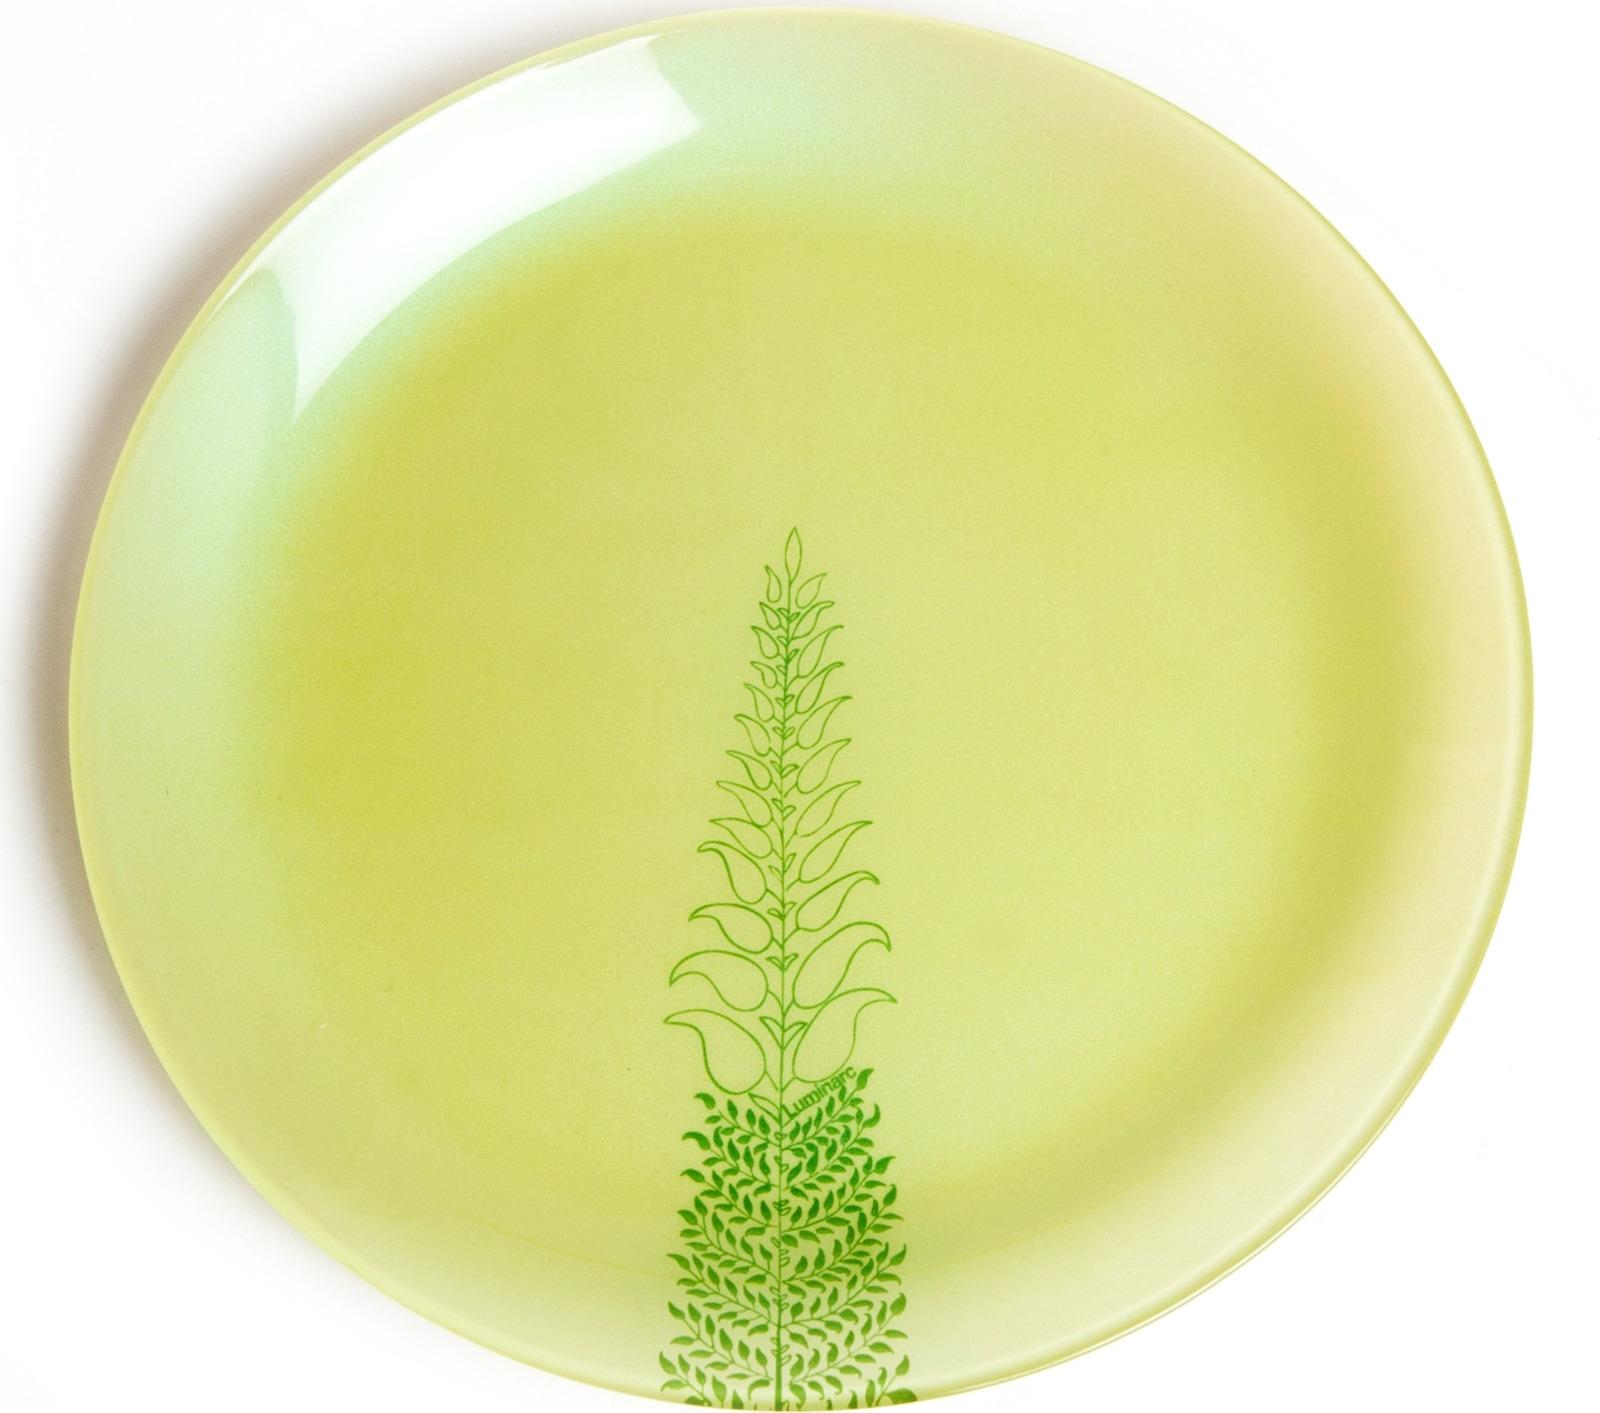 Тарелка десертная Luminarc Симпли Лобелия, L8362, светло-зеленый, диаметр 20.5 см